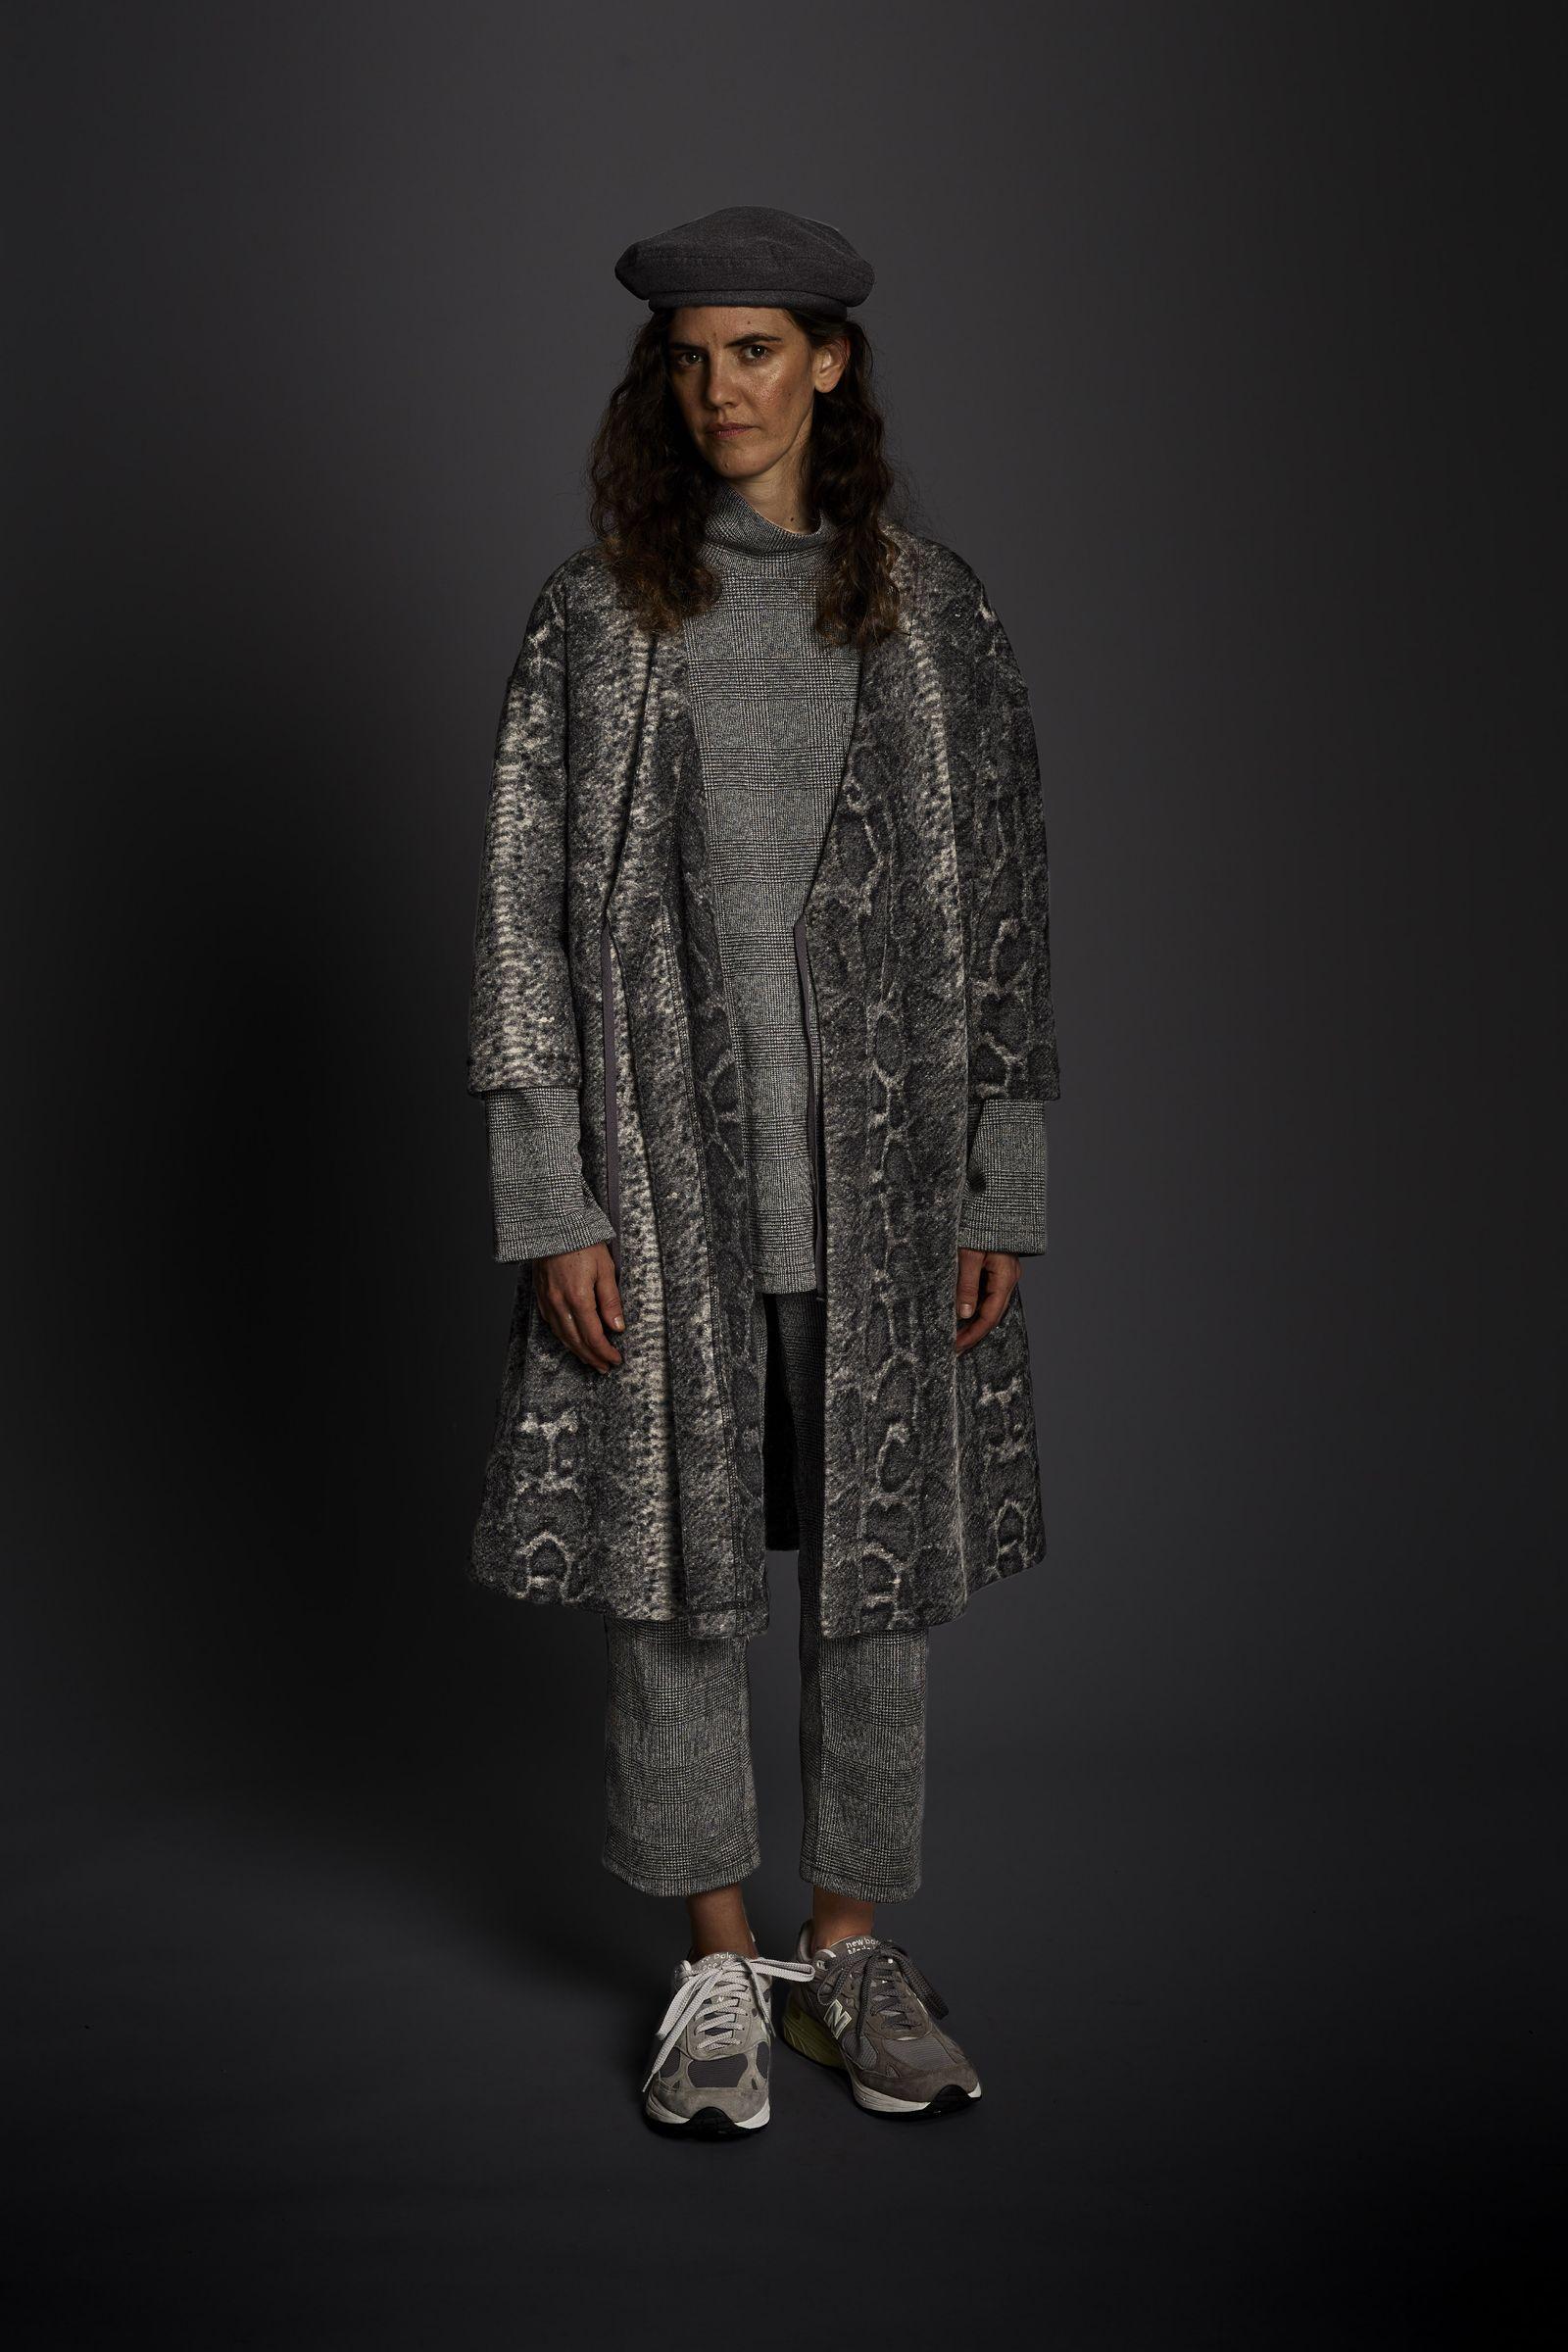 engineered-garments-fall-winter-2020-23